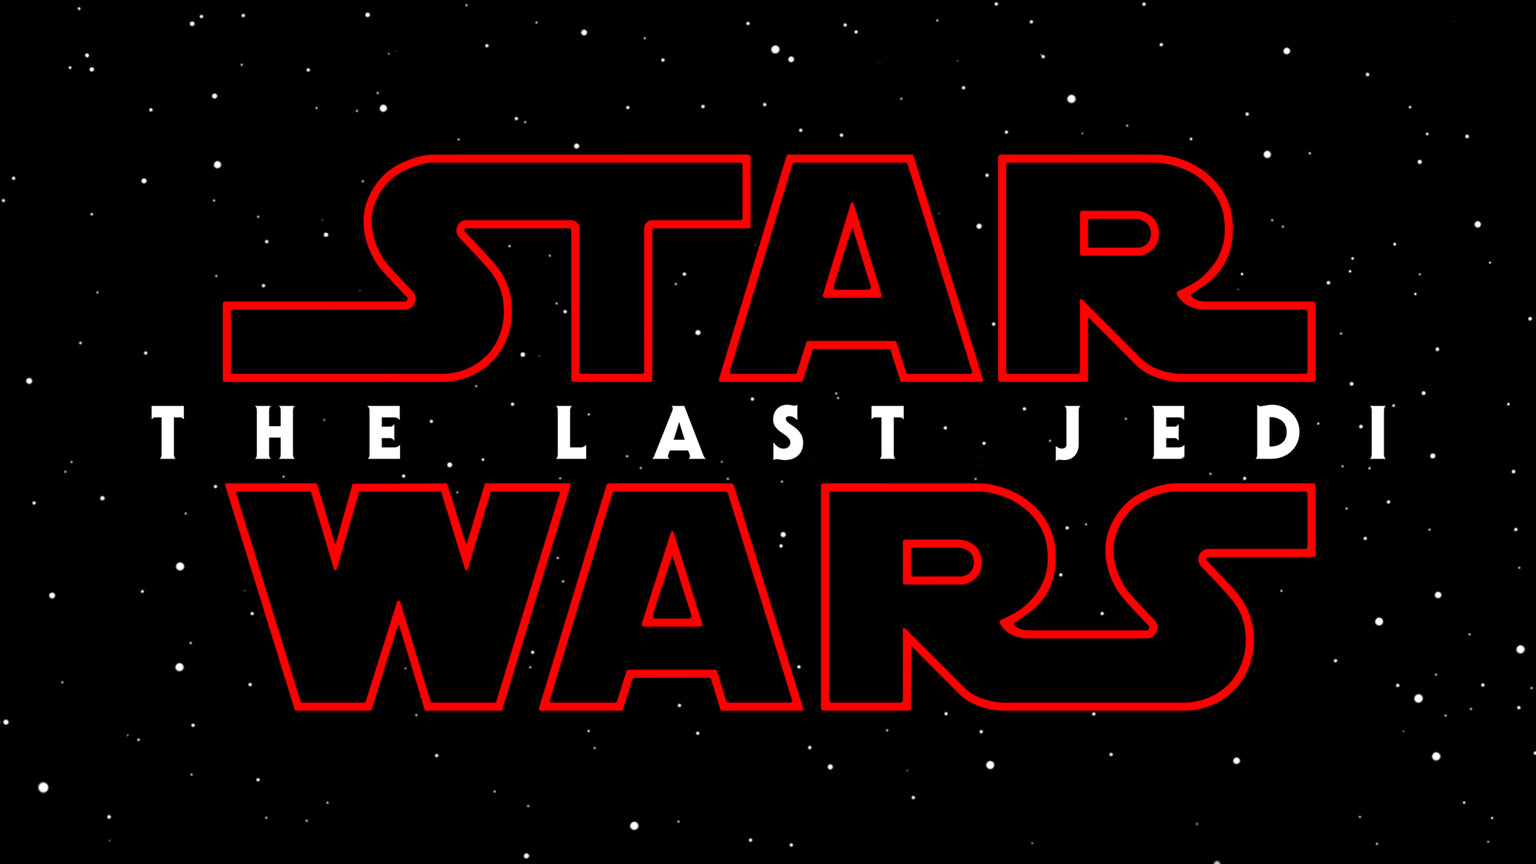 Un nou promo Star Wars The Last Jedi a fost lansat